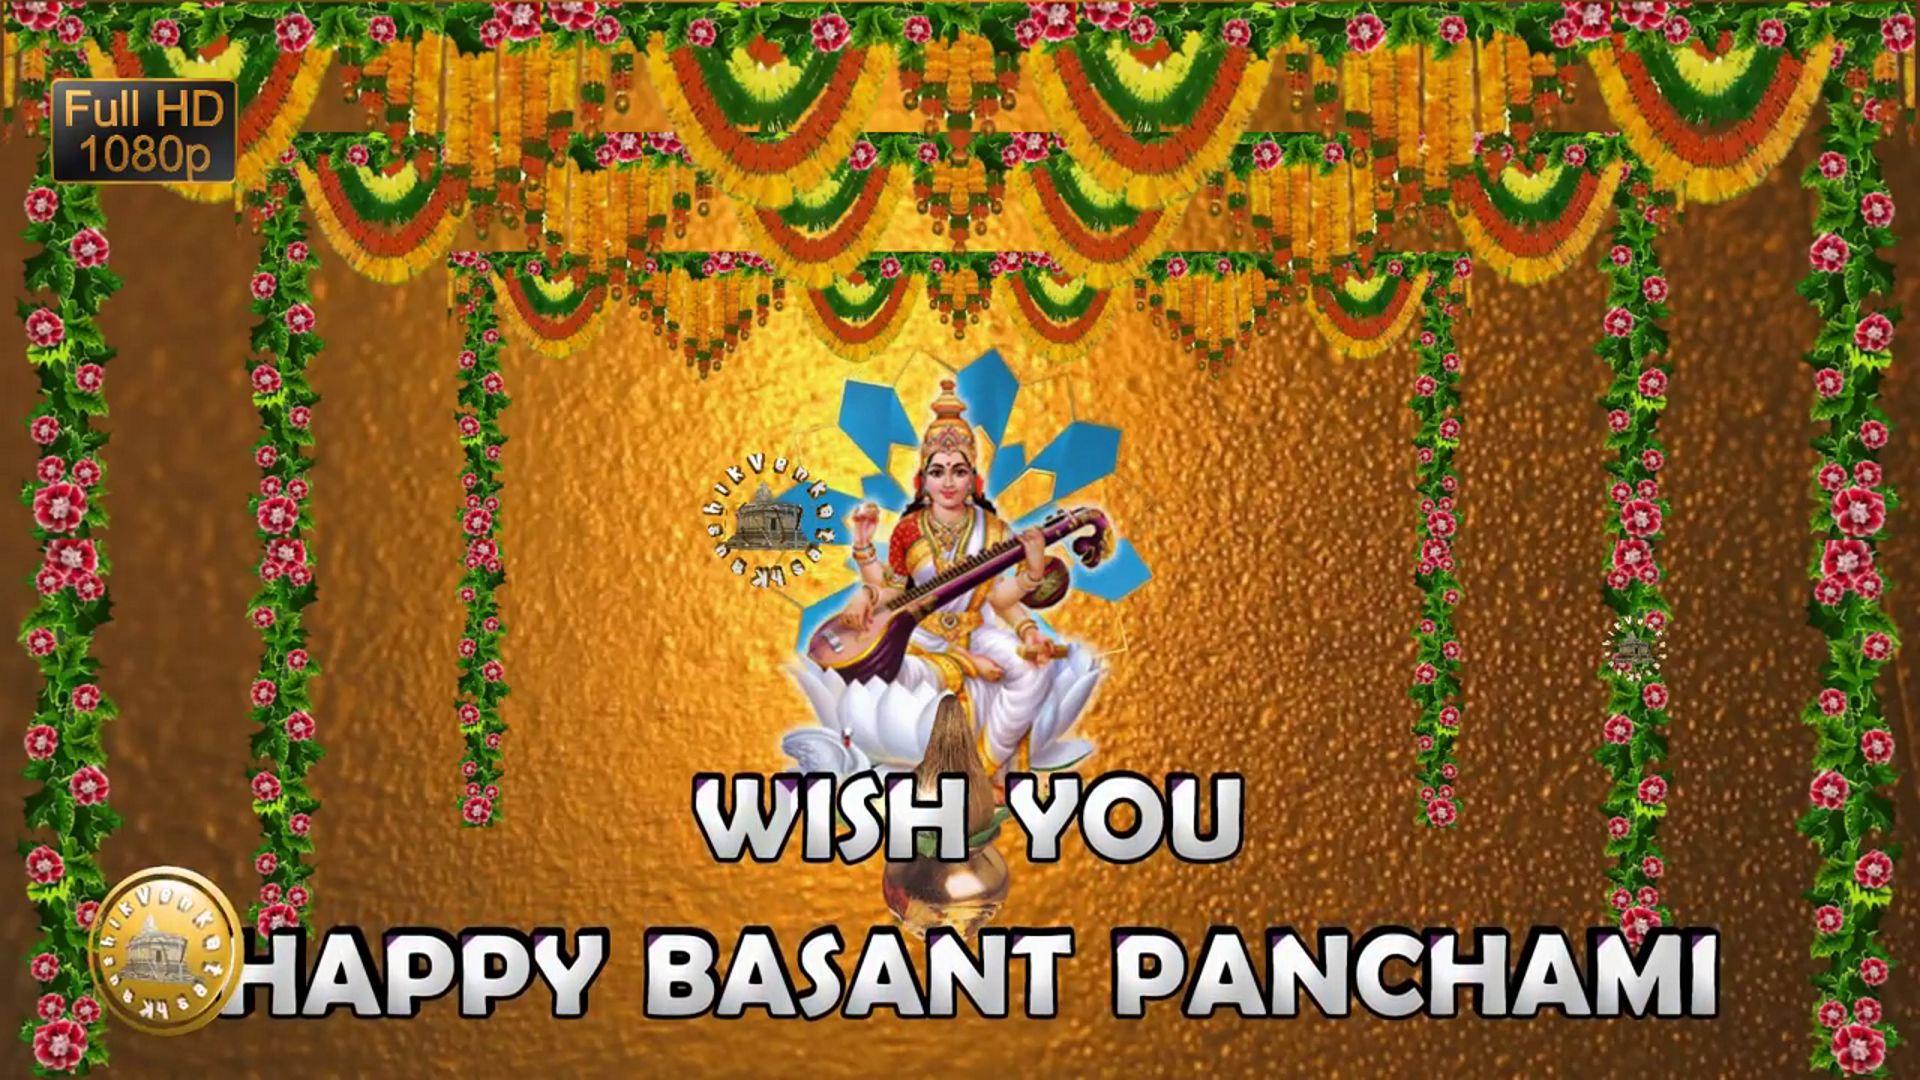 Full Hd image of Basant Panchami Wishes